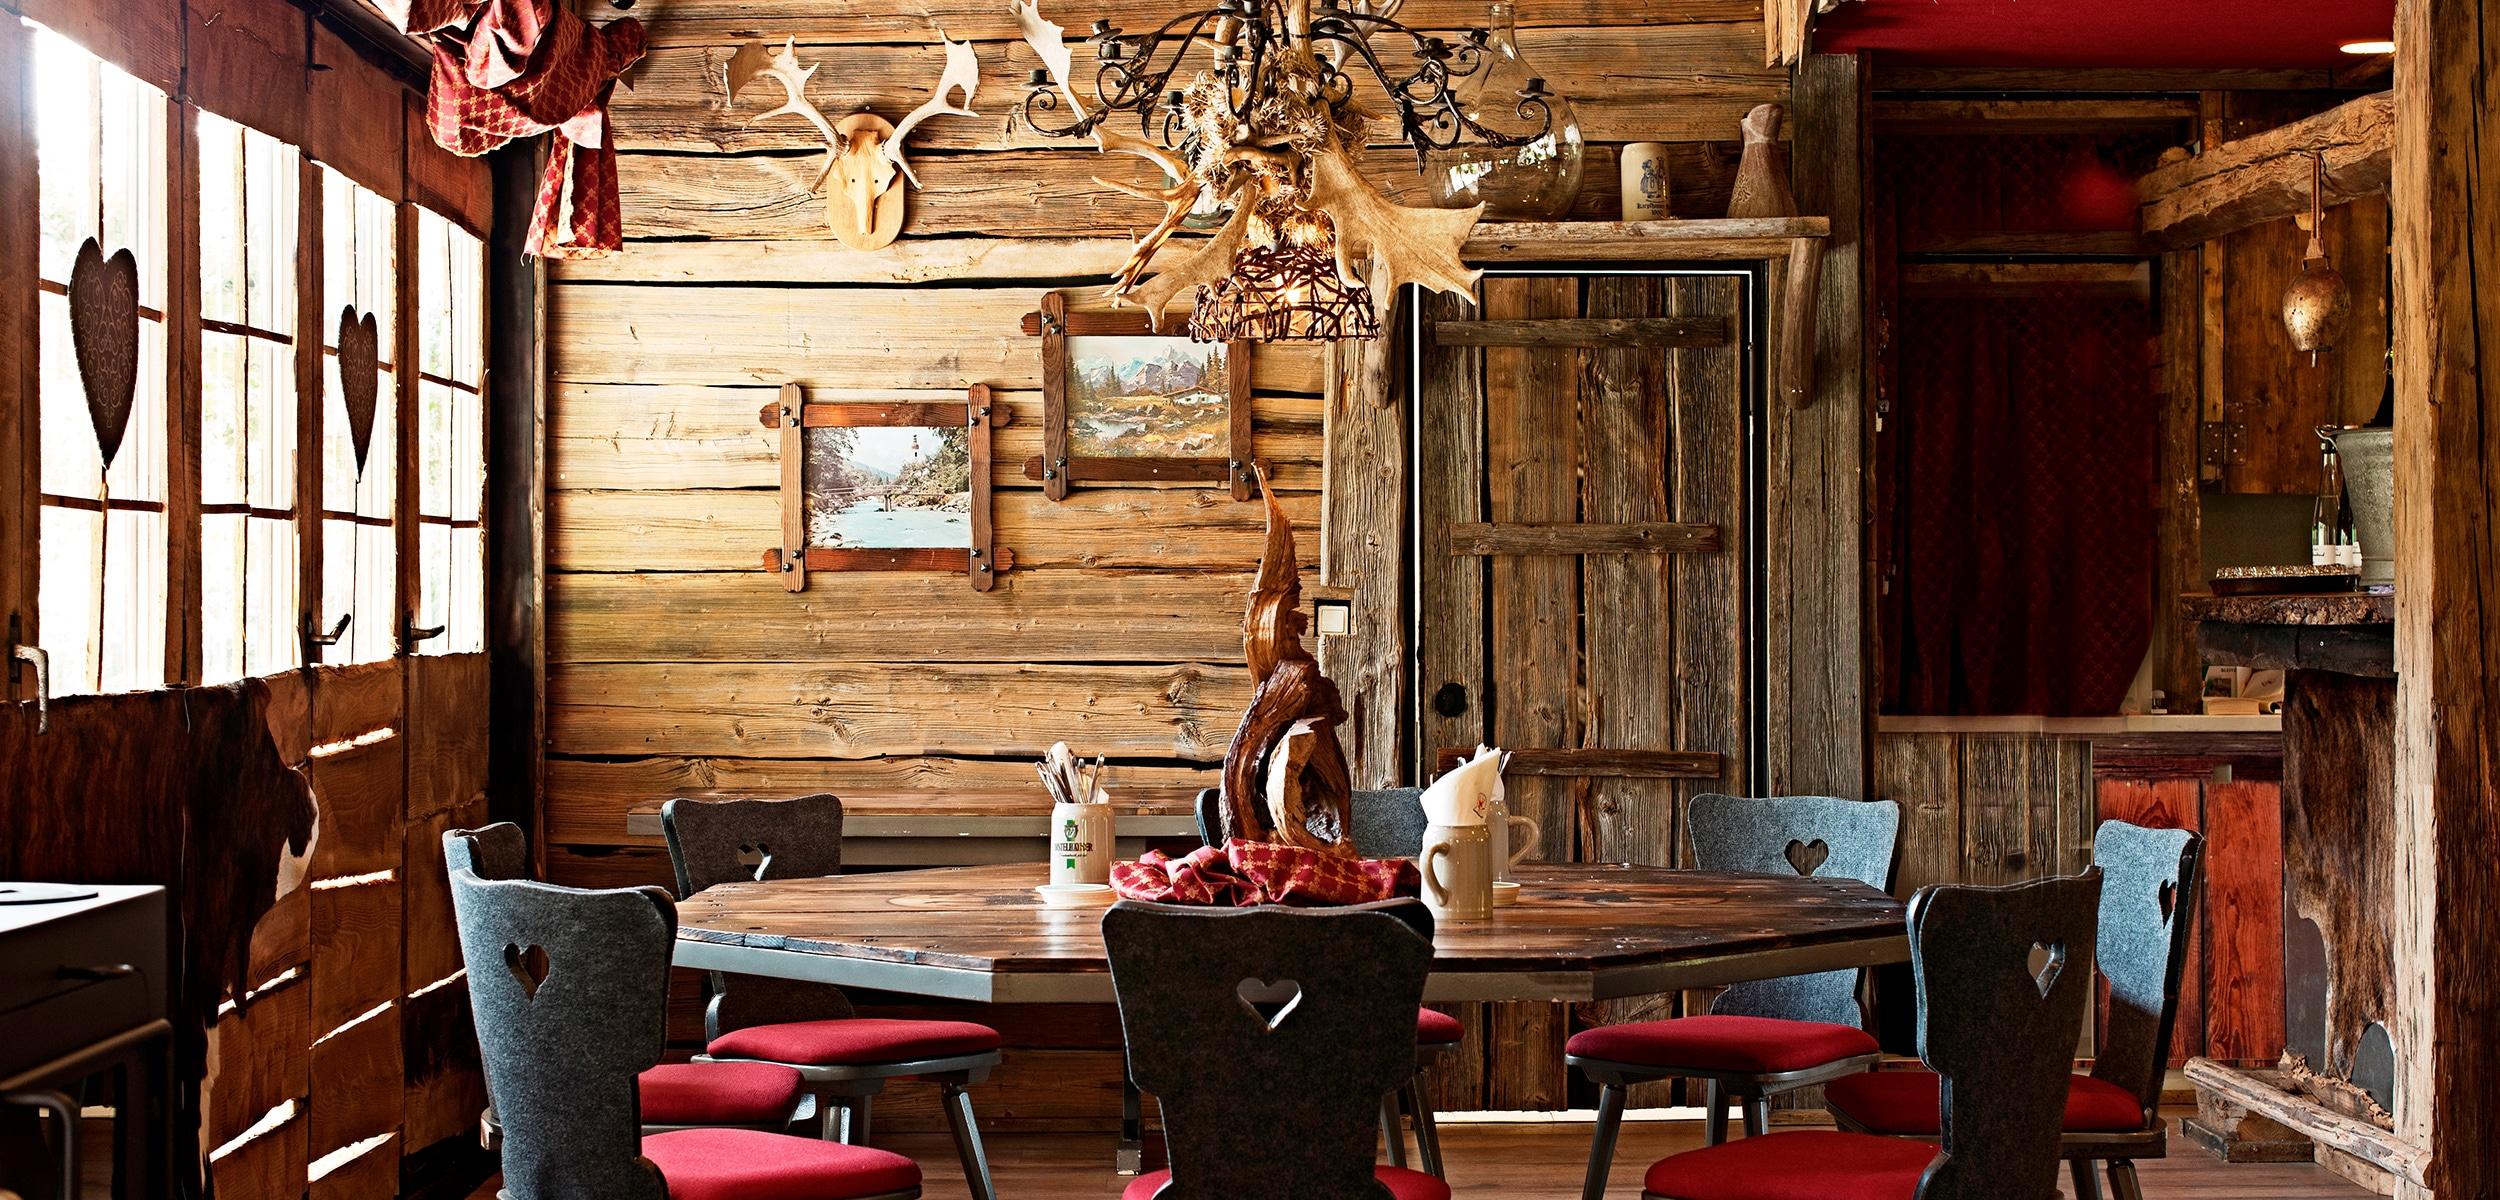 Sitzecke in rustikaler Waldschänke